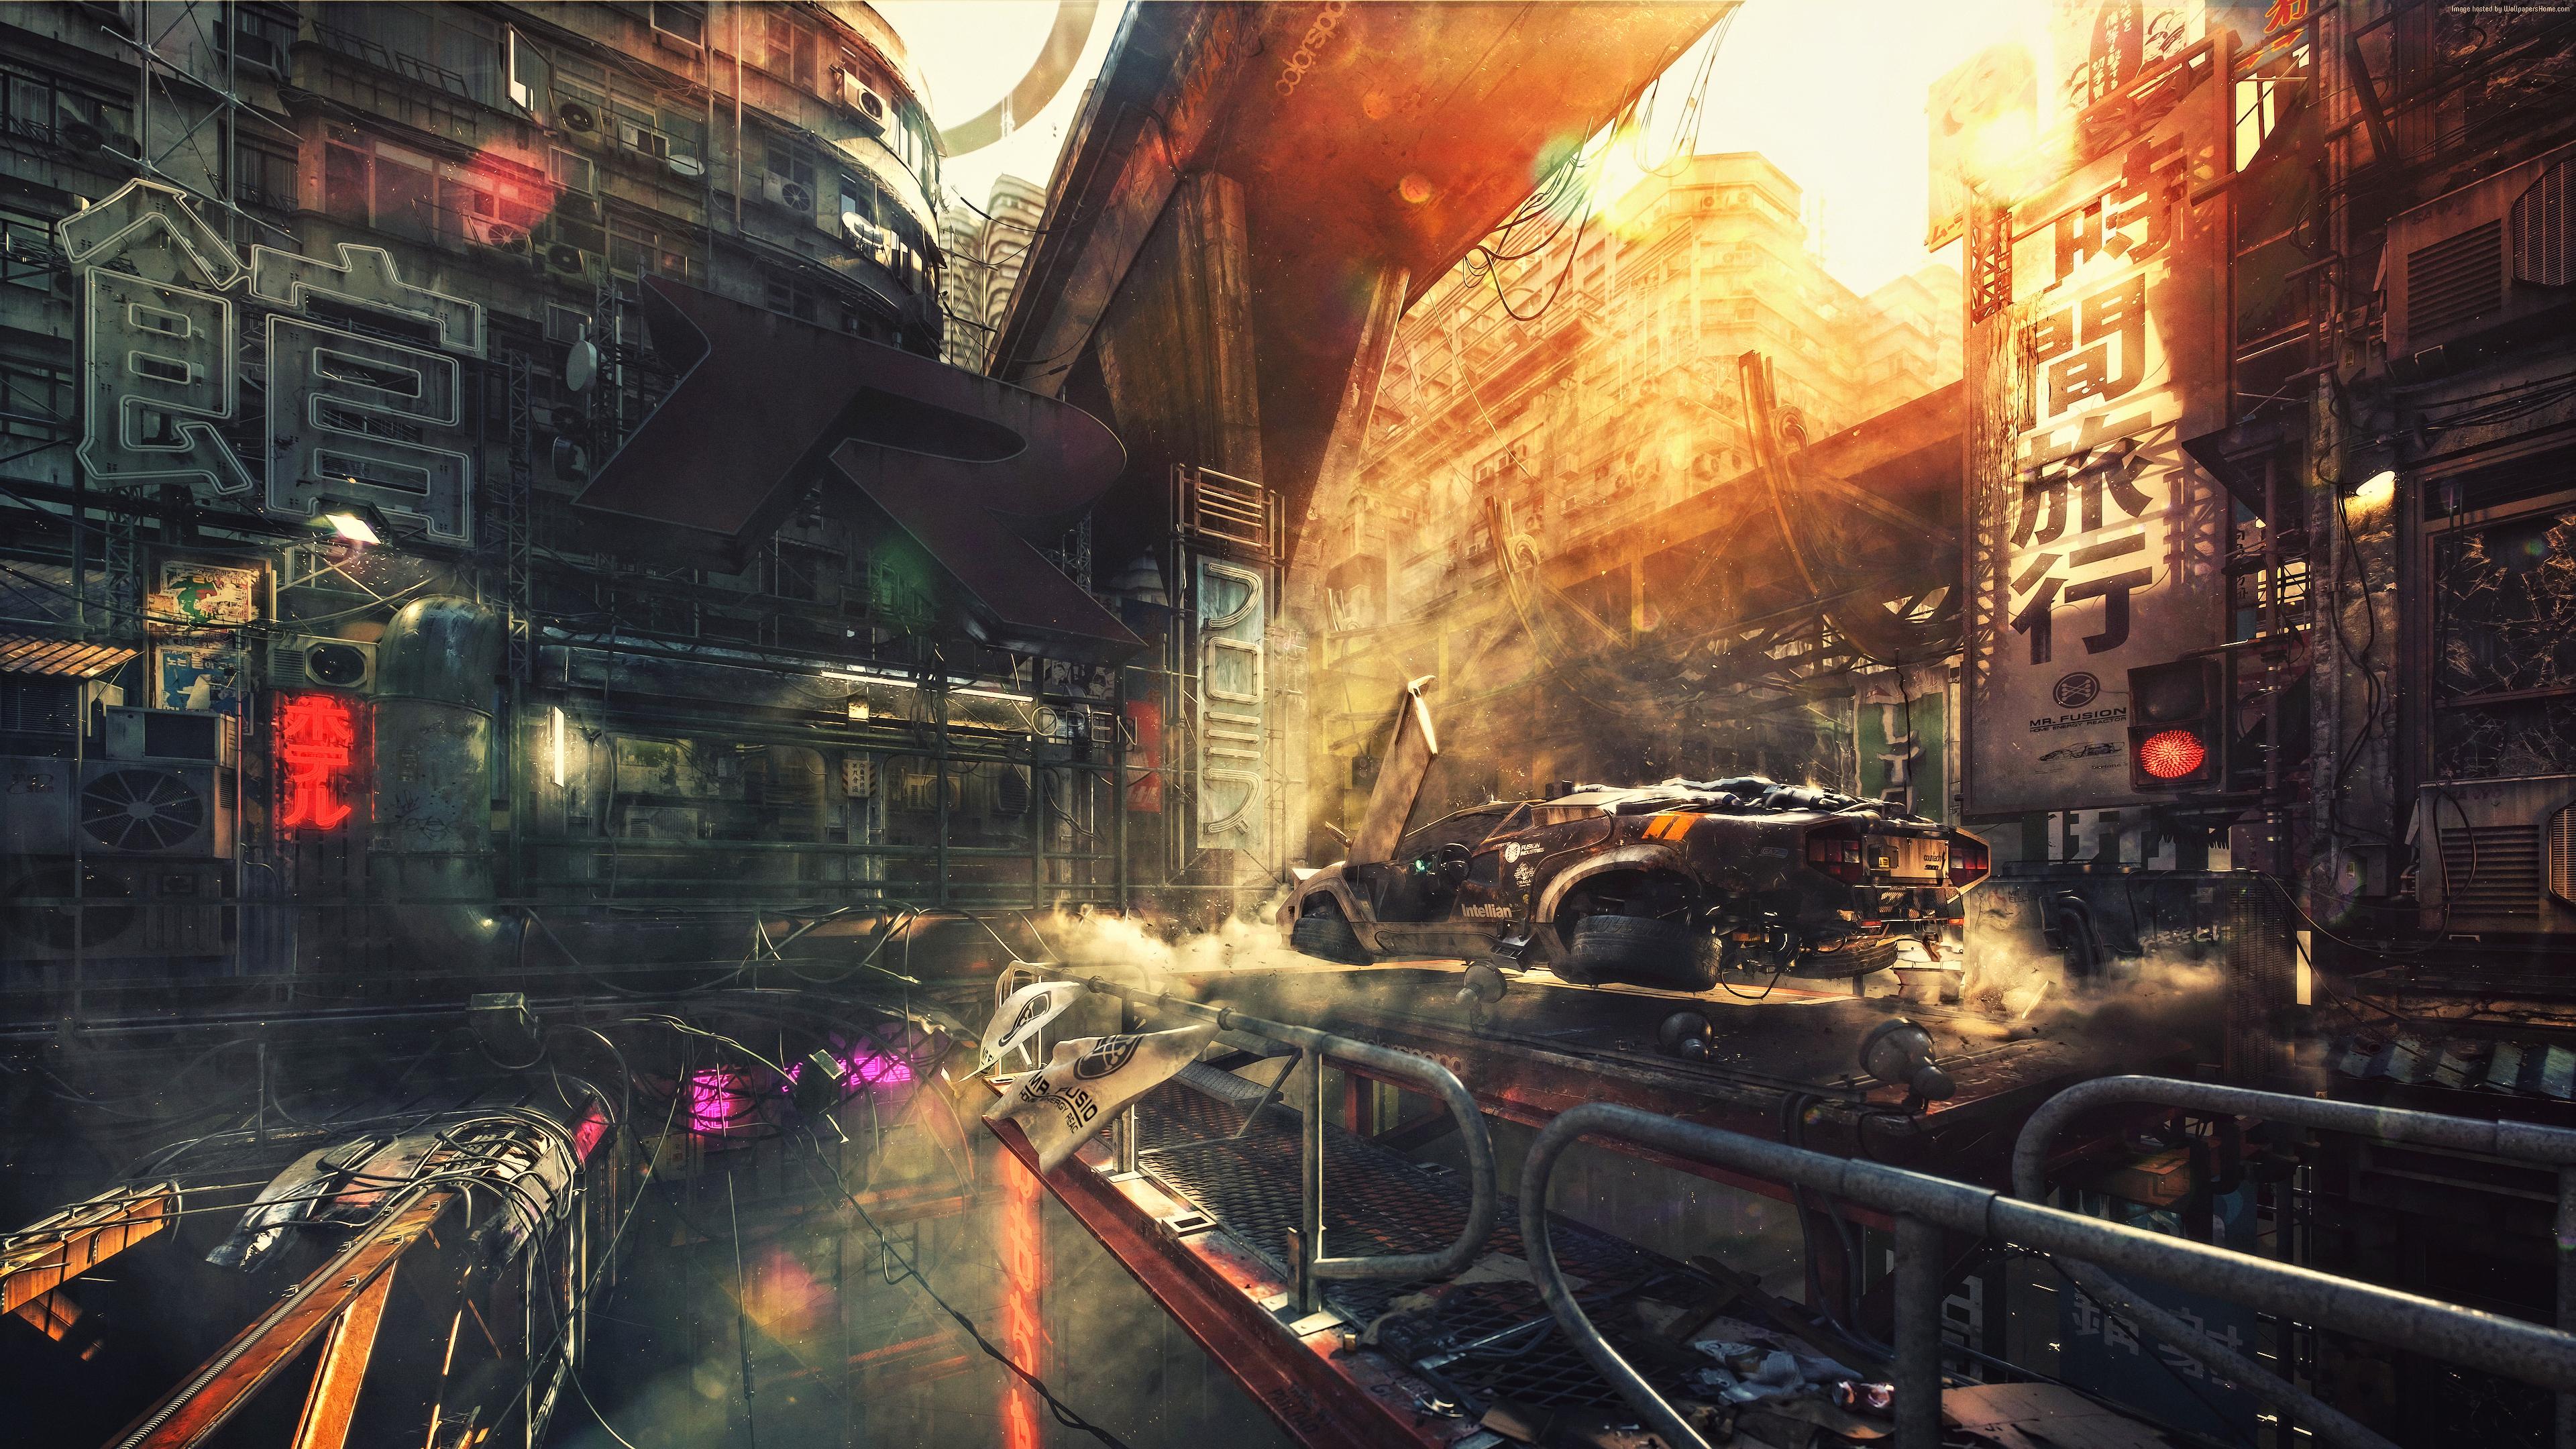 General 3840x2160 science fiction digital art concept art artwork futuristic fantasy art fan art 3D CGI sunset spaceship cyberpunk cyber city Countach Lamborghini Countach